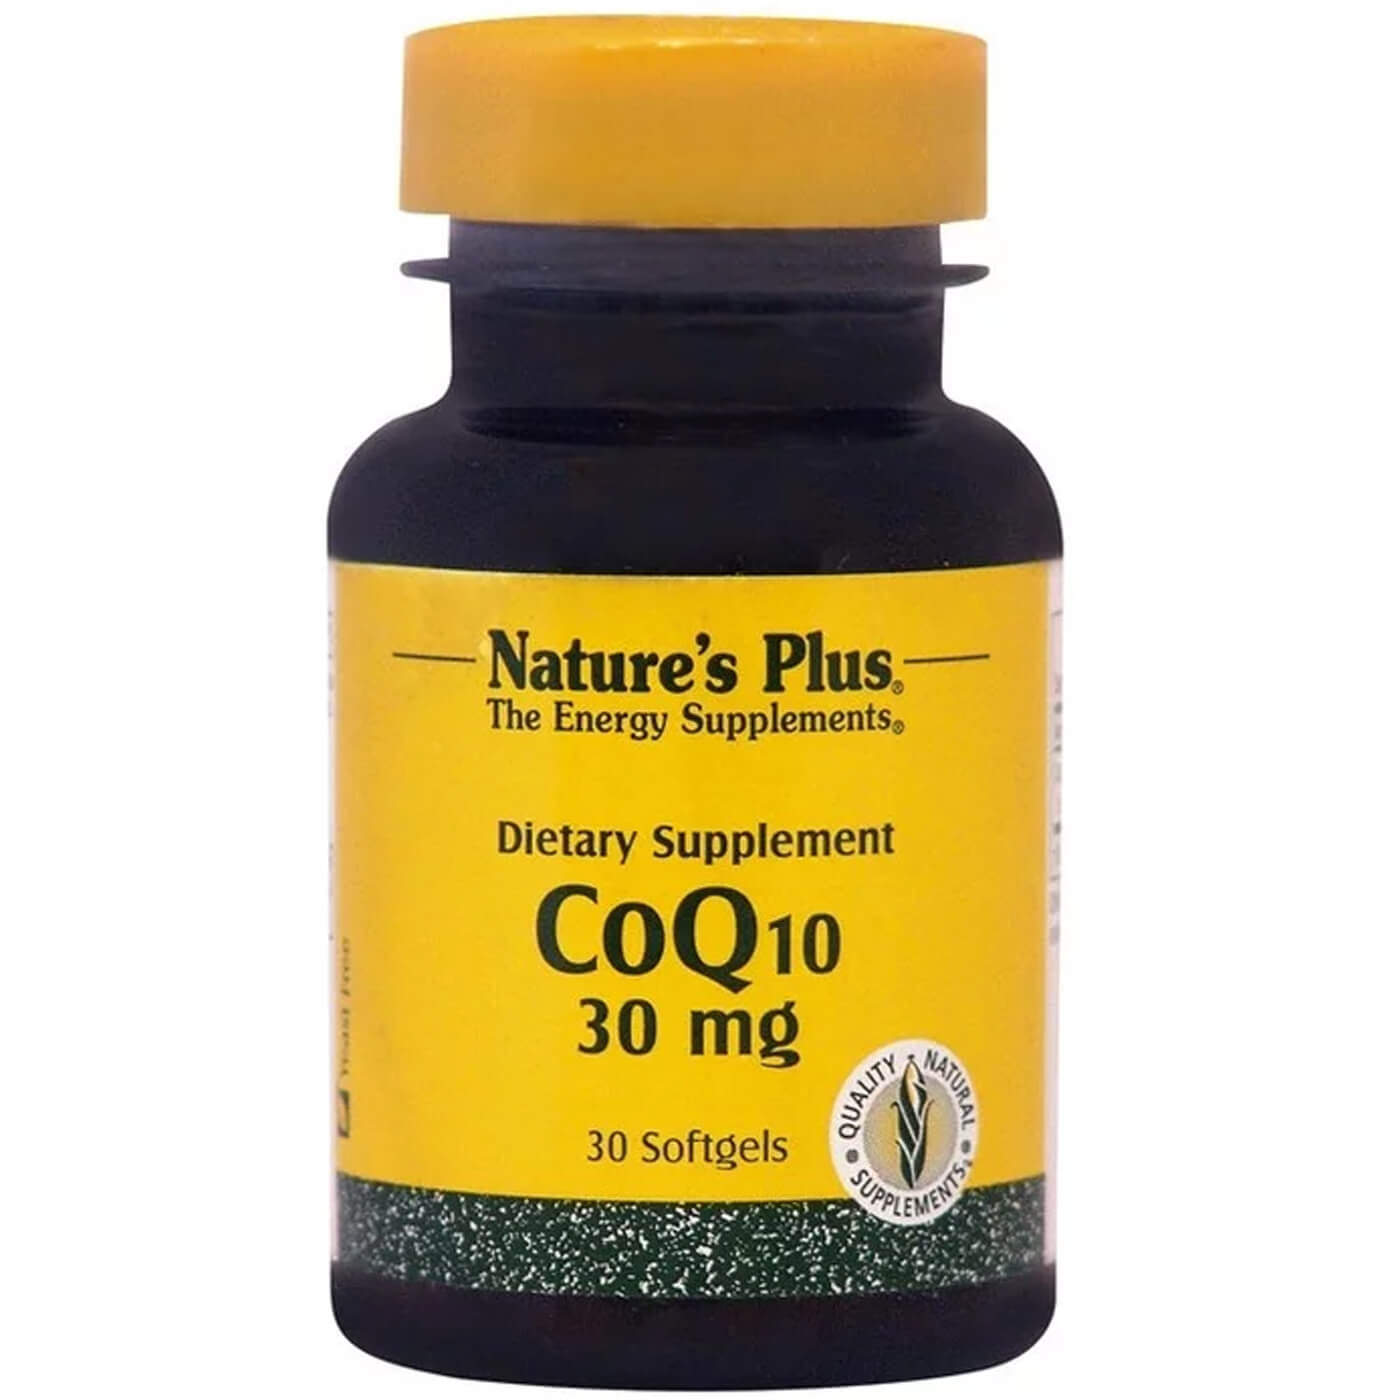 Natures Plus Coenzyme Q10 30mg Συμπλήρωμα Διατροφής Κατάλληλο για Παραγωγή Ενέργειας & για Καρδιαγγειακές Παθήσεις 30softgels